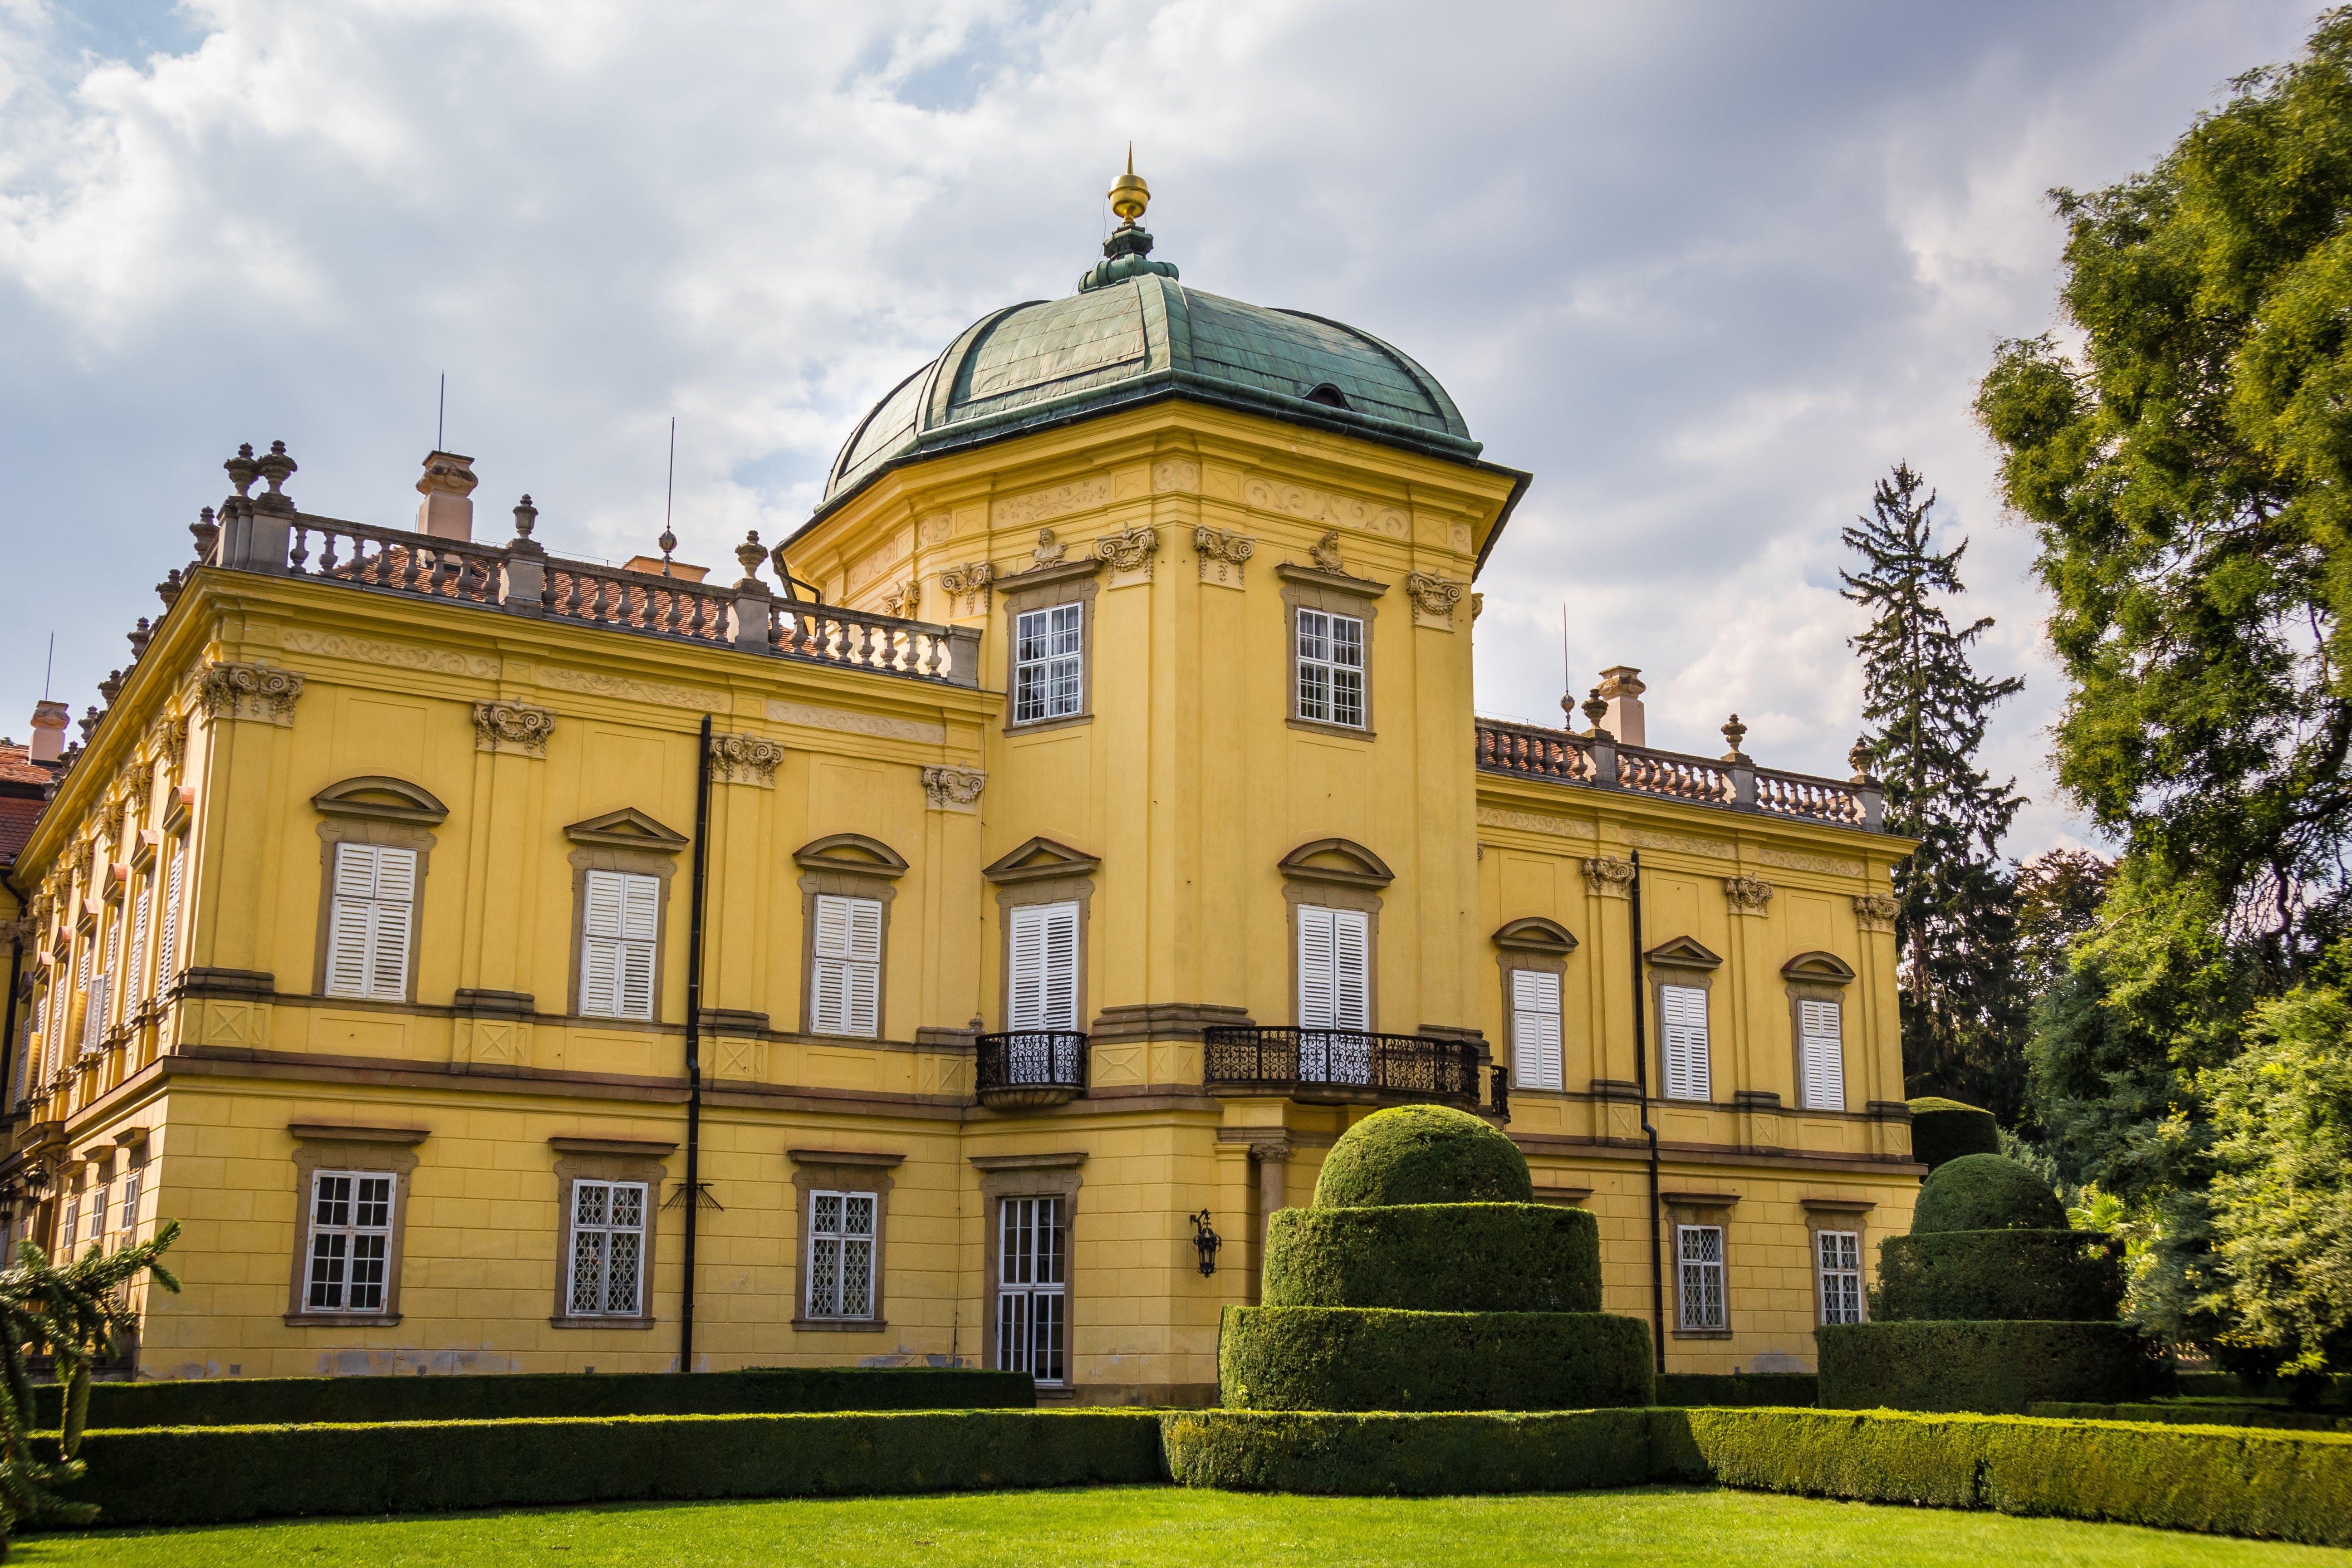 architectural, chateau, historic